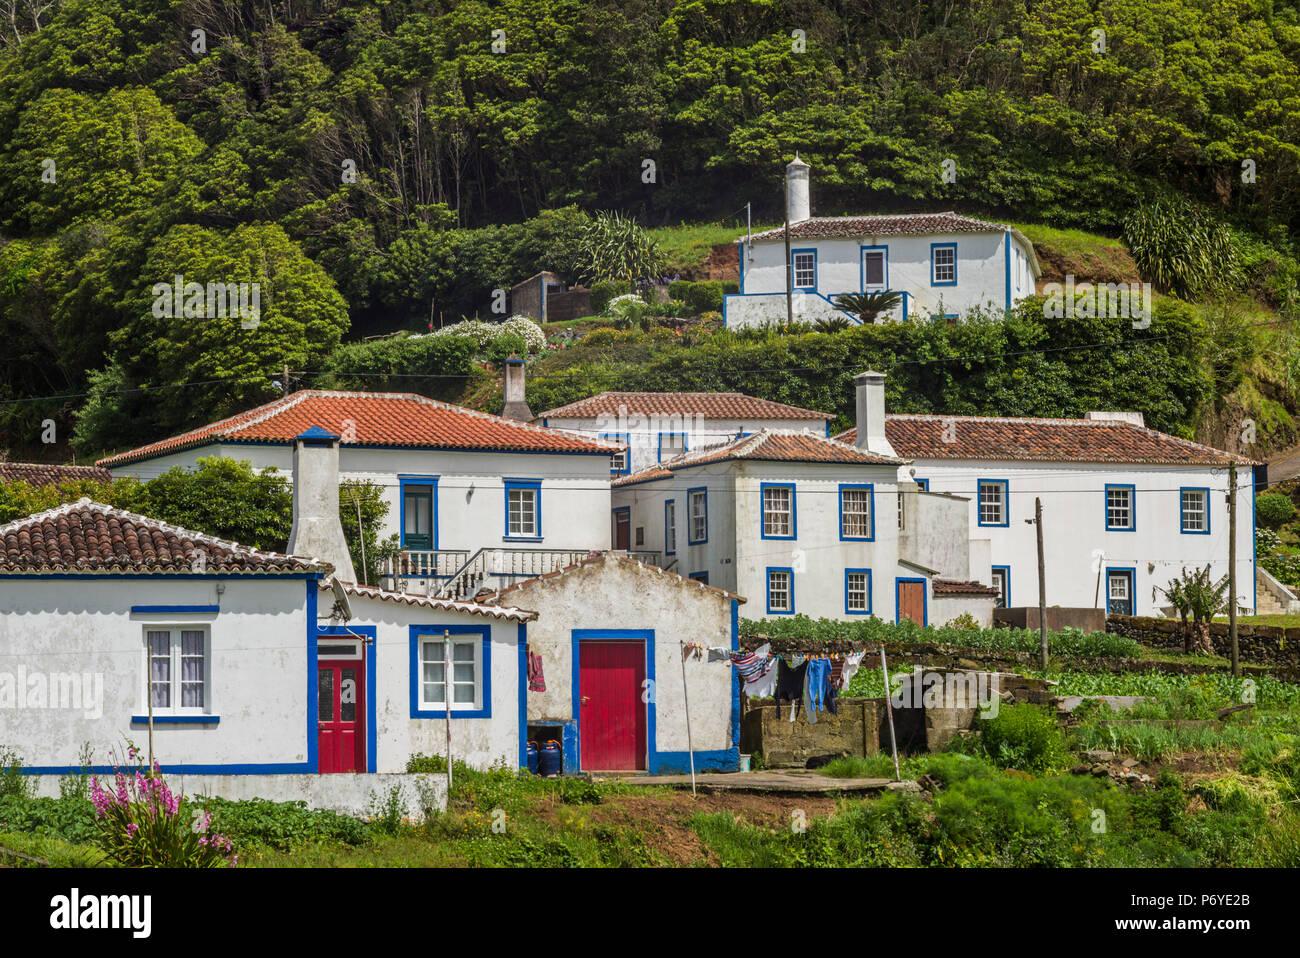 Portugal, Azores, Santa Maria Island, Santa Barbara - Stock Image